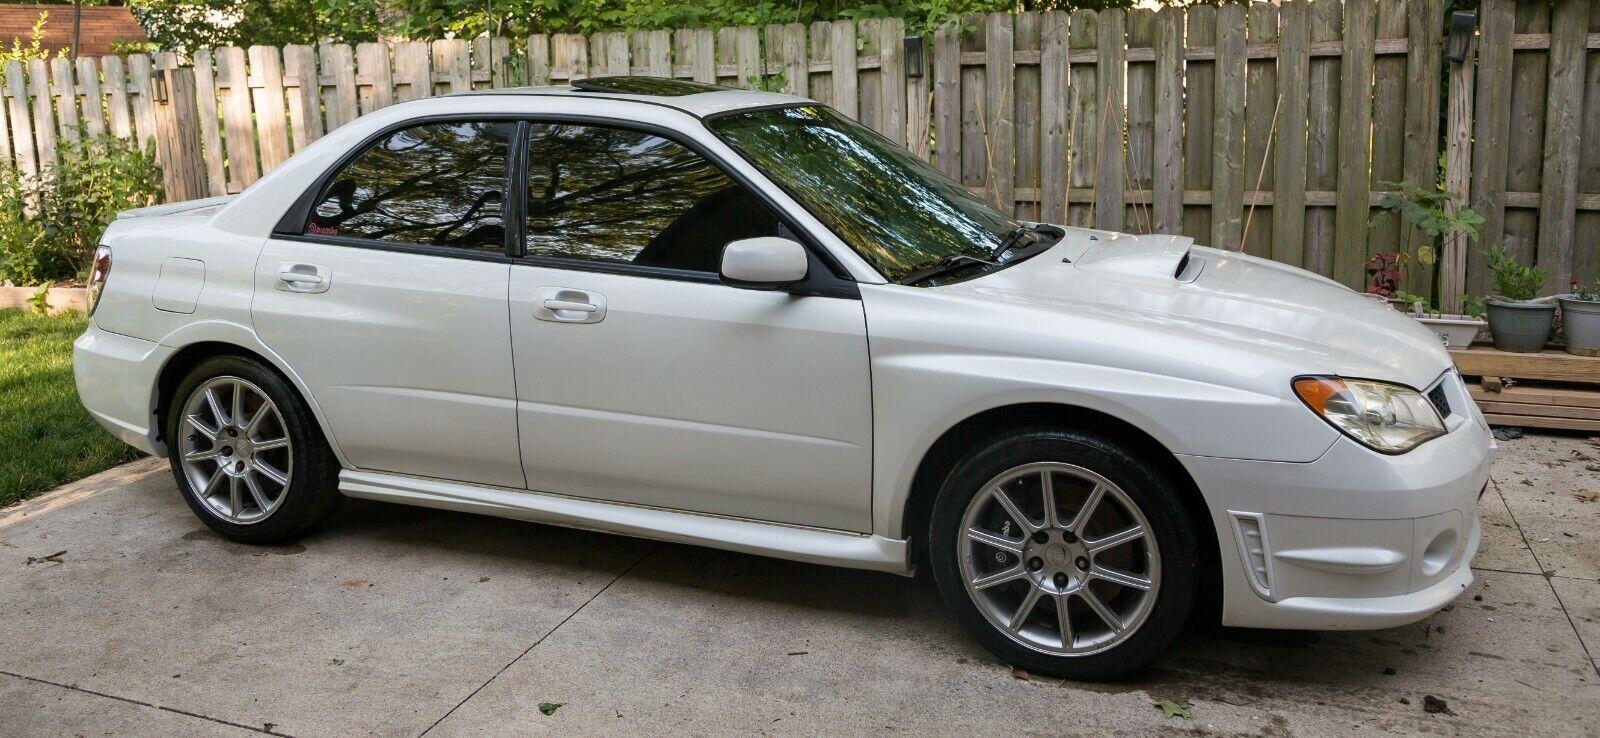 2007 Subaru WRX WRX Sti Limited